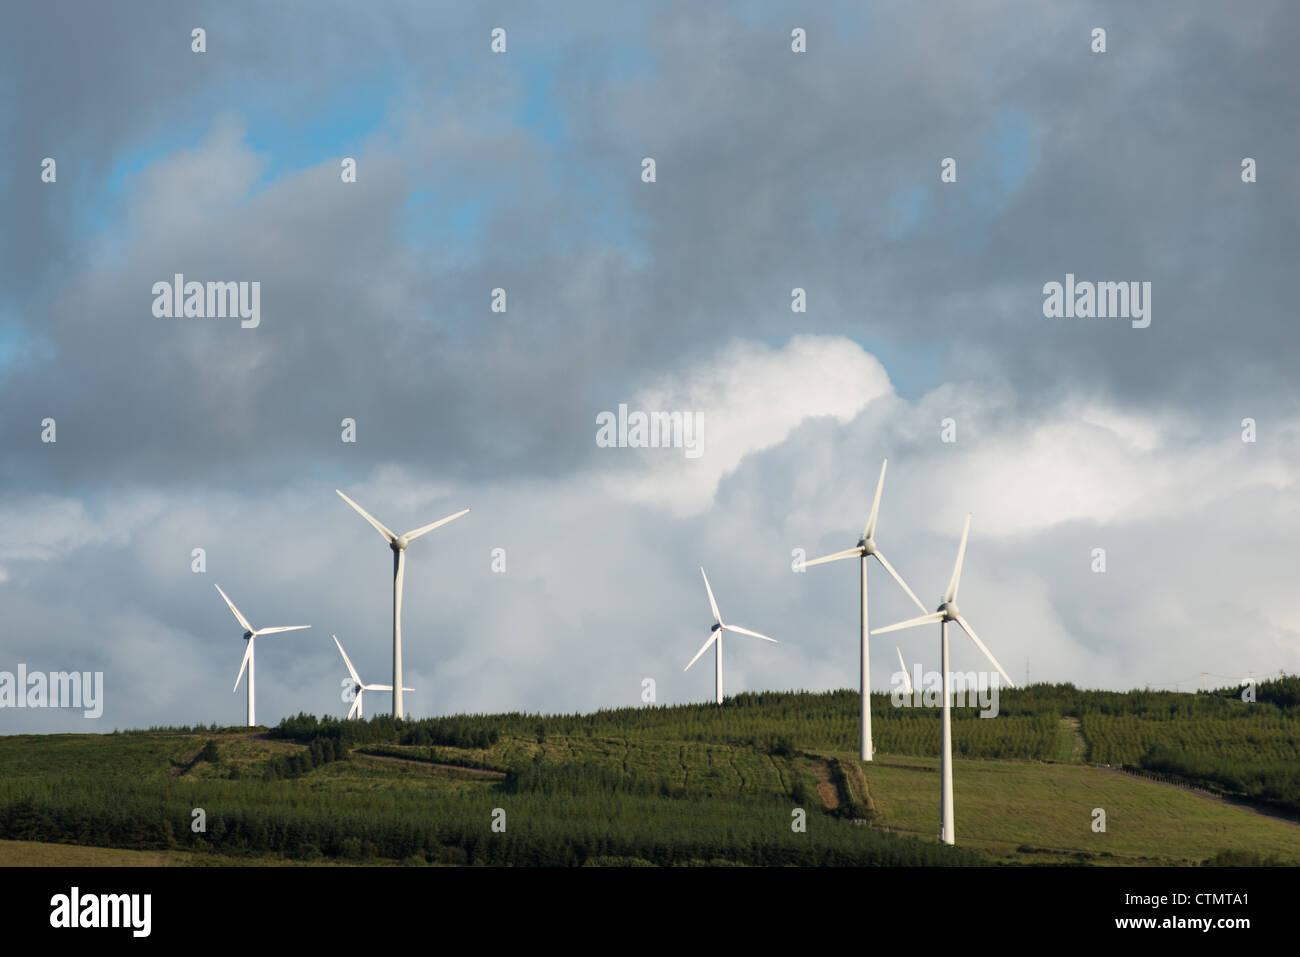 Wind Turbines in County Kerry, Republic of Ireland. - Stock Image